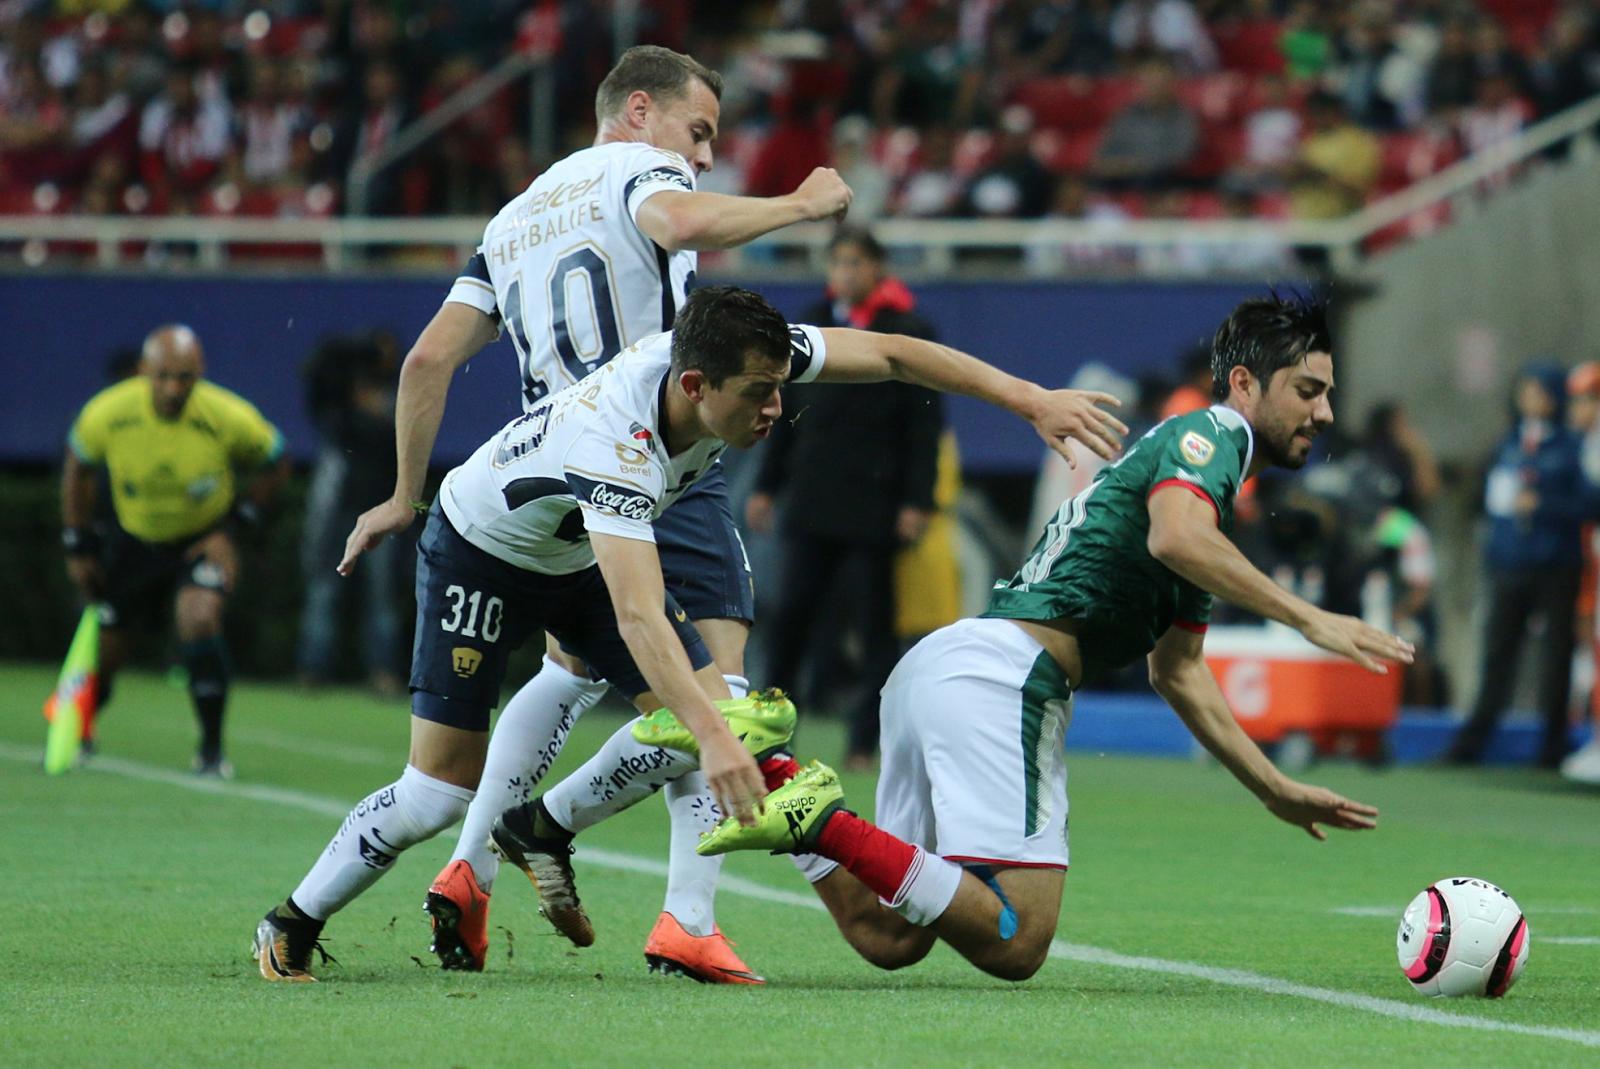 Chivas Pumas Liga MX Jornada 9 A qué hora juega